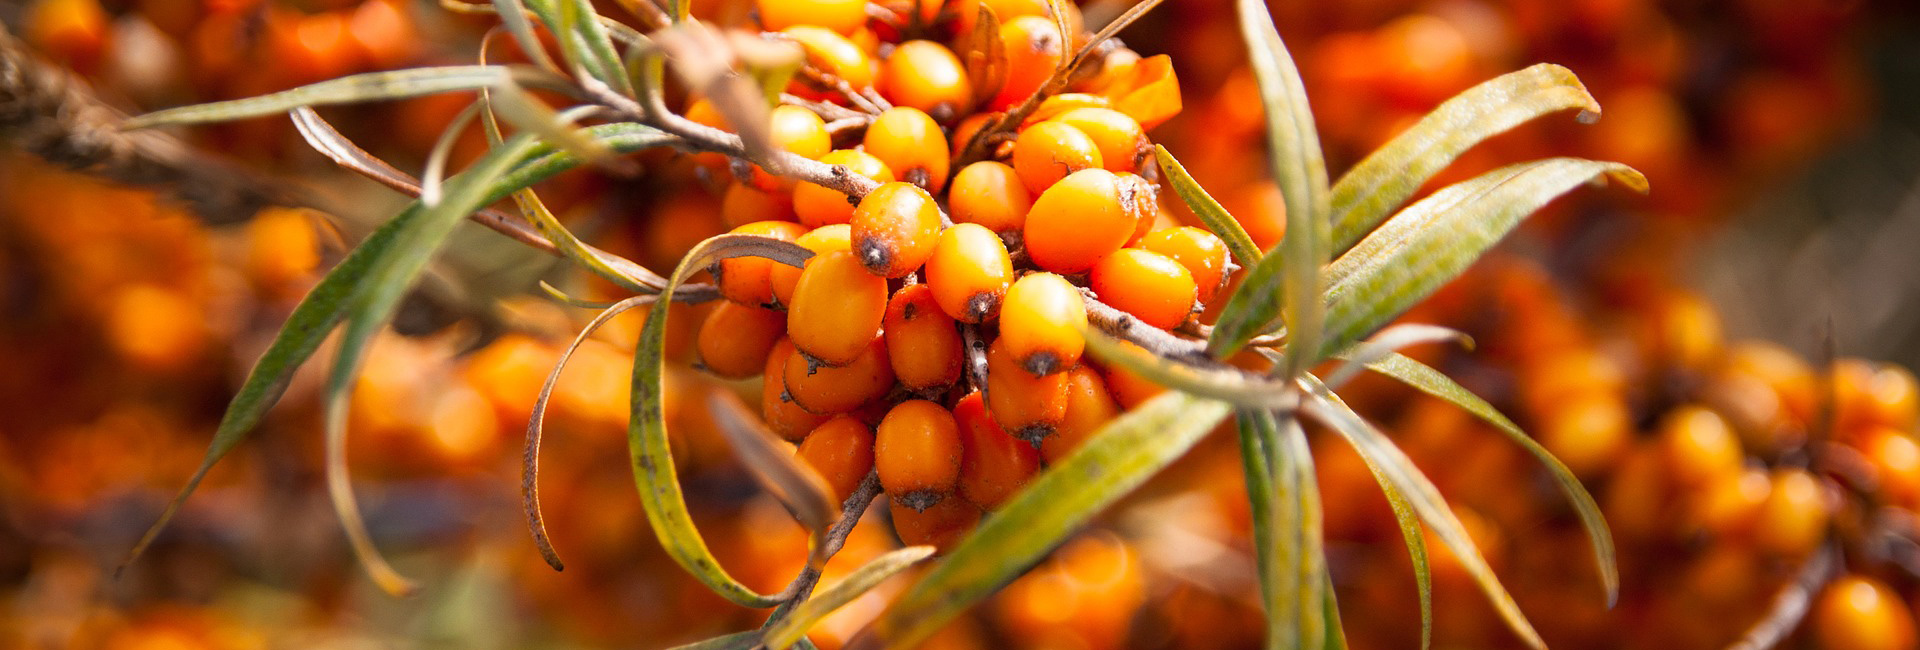 Duindoornbes–vitamineA-Membrasin